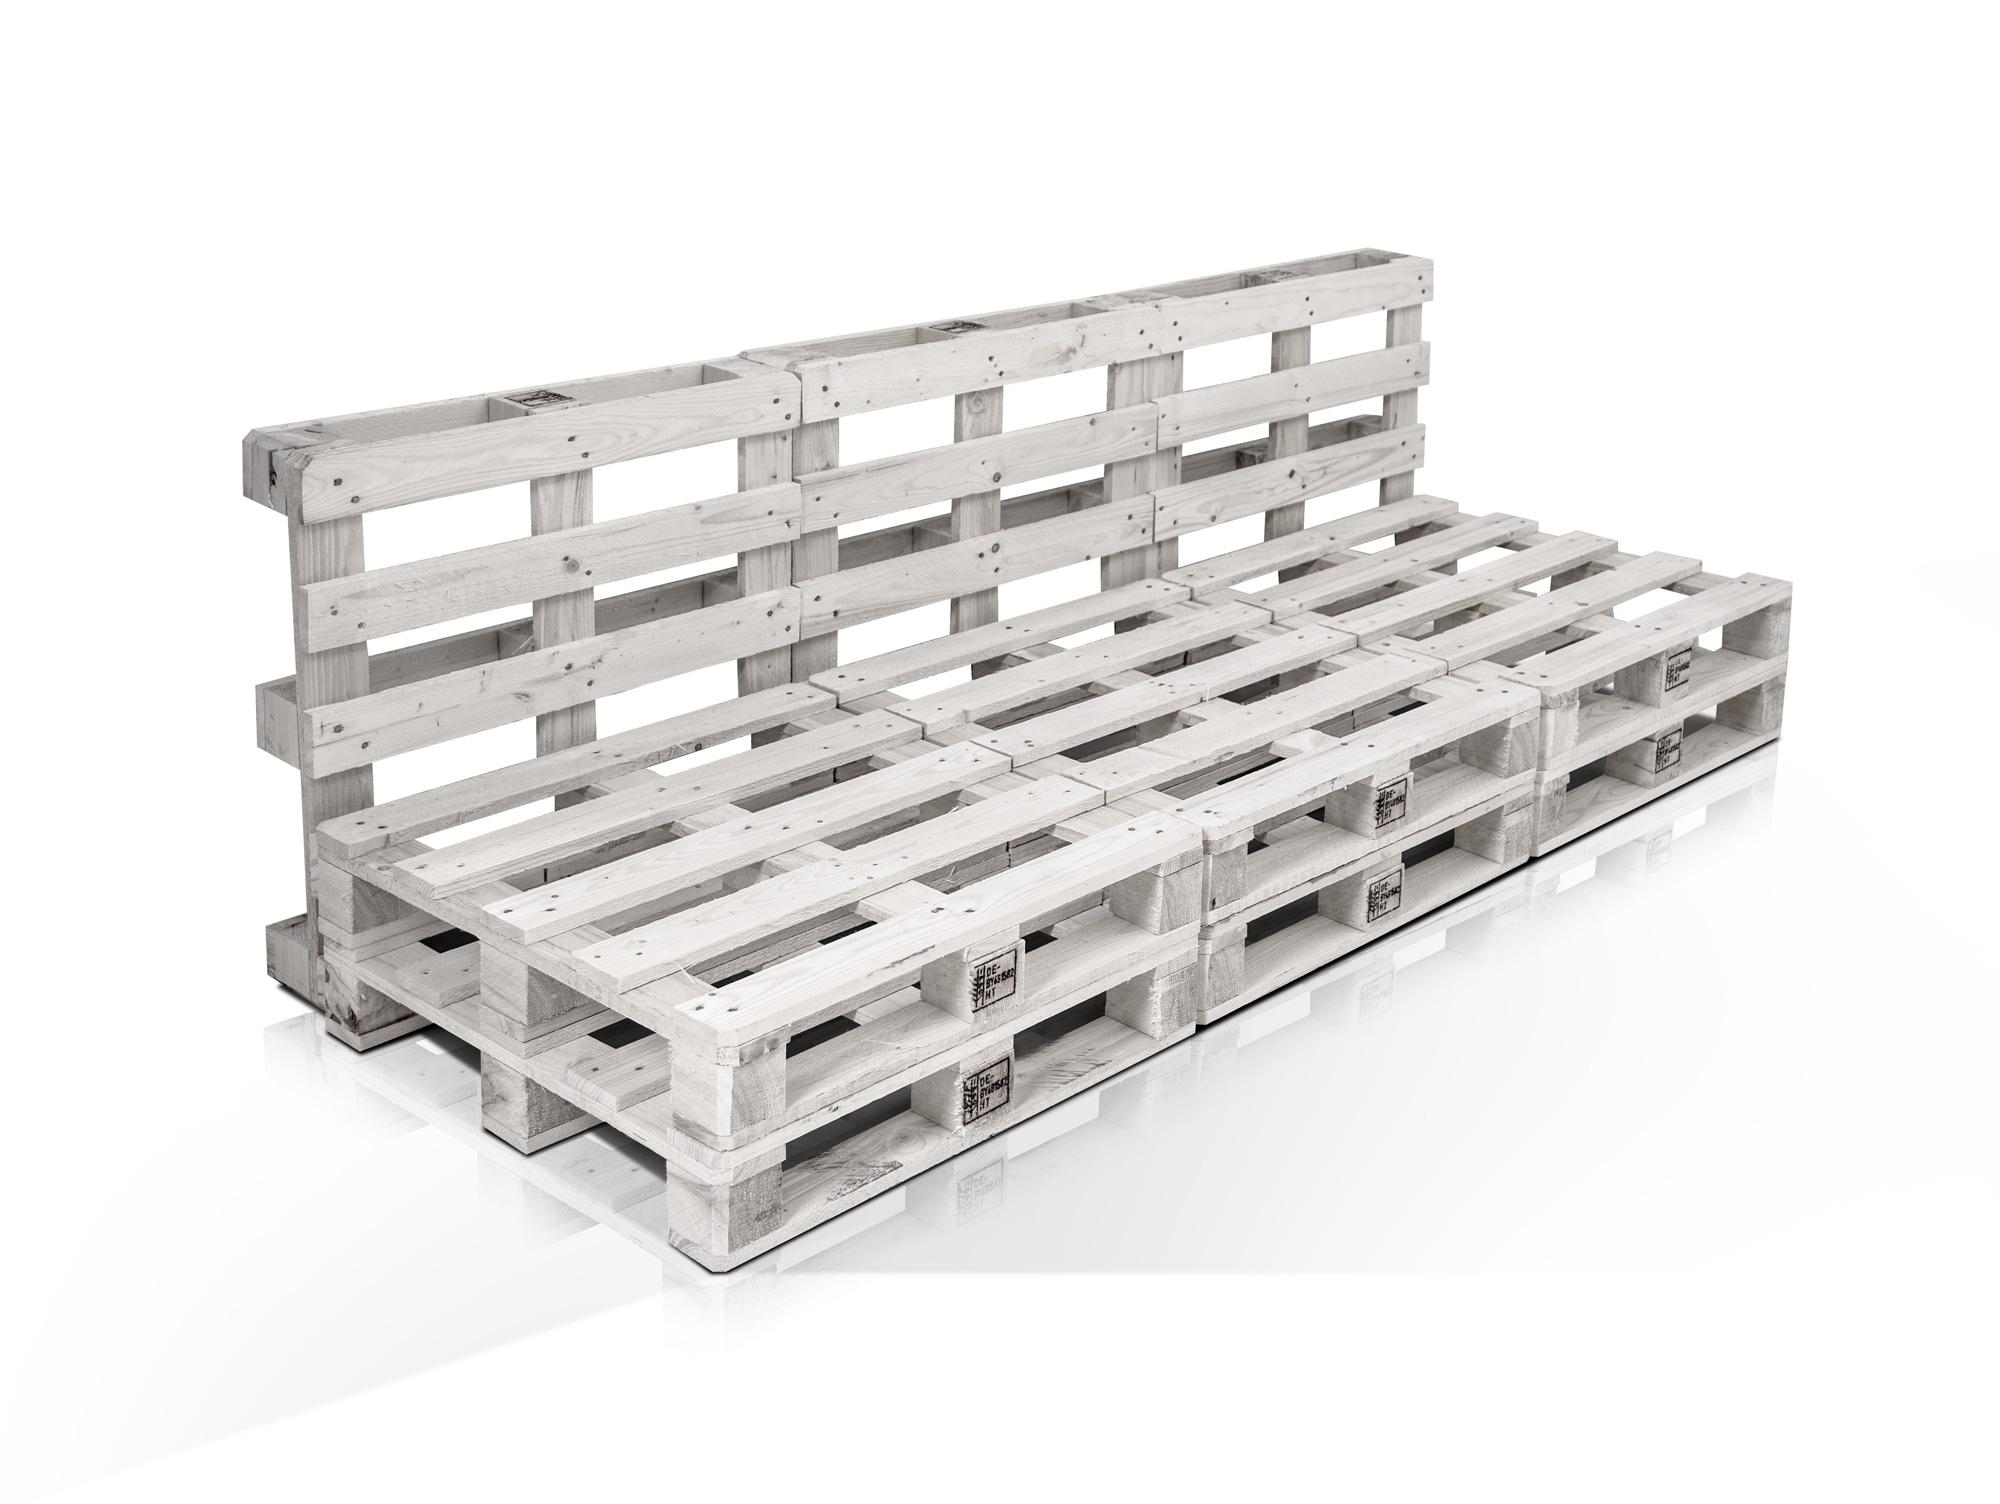 paletti 3 sitzer sofa aus paletten kiefer weiss lackiert. Black Bedroom Furniture Sets. Home Design Ideas